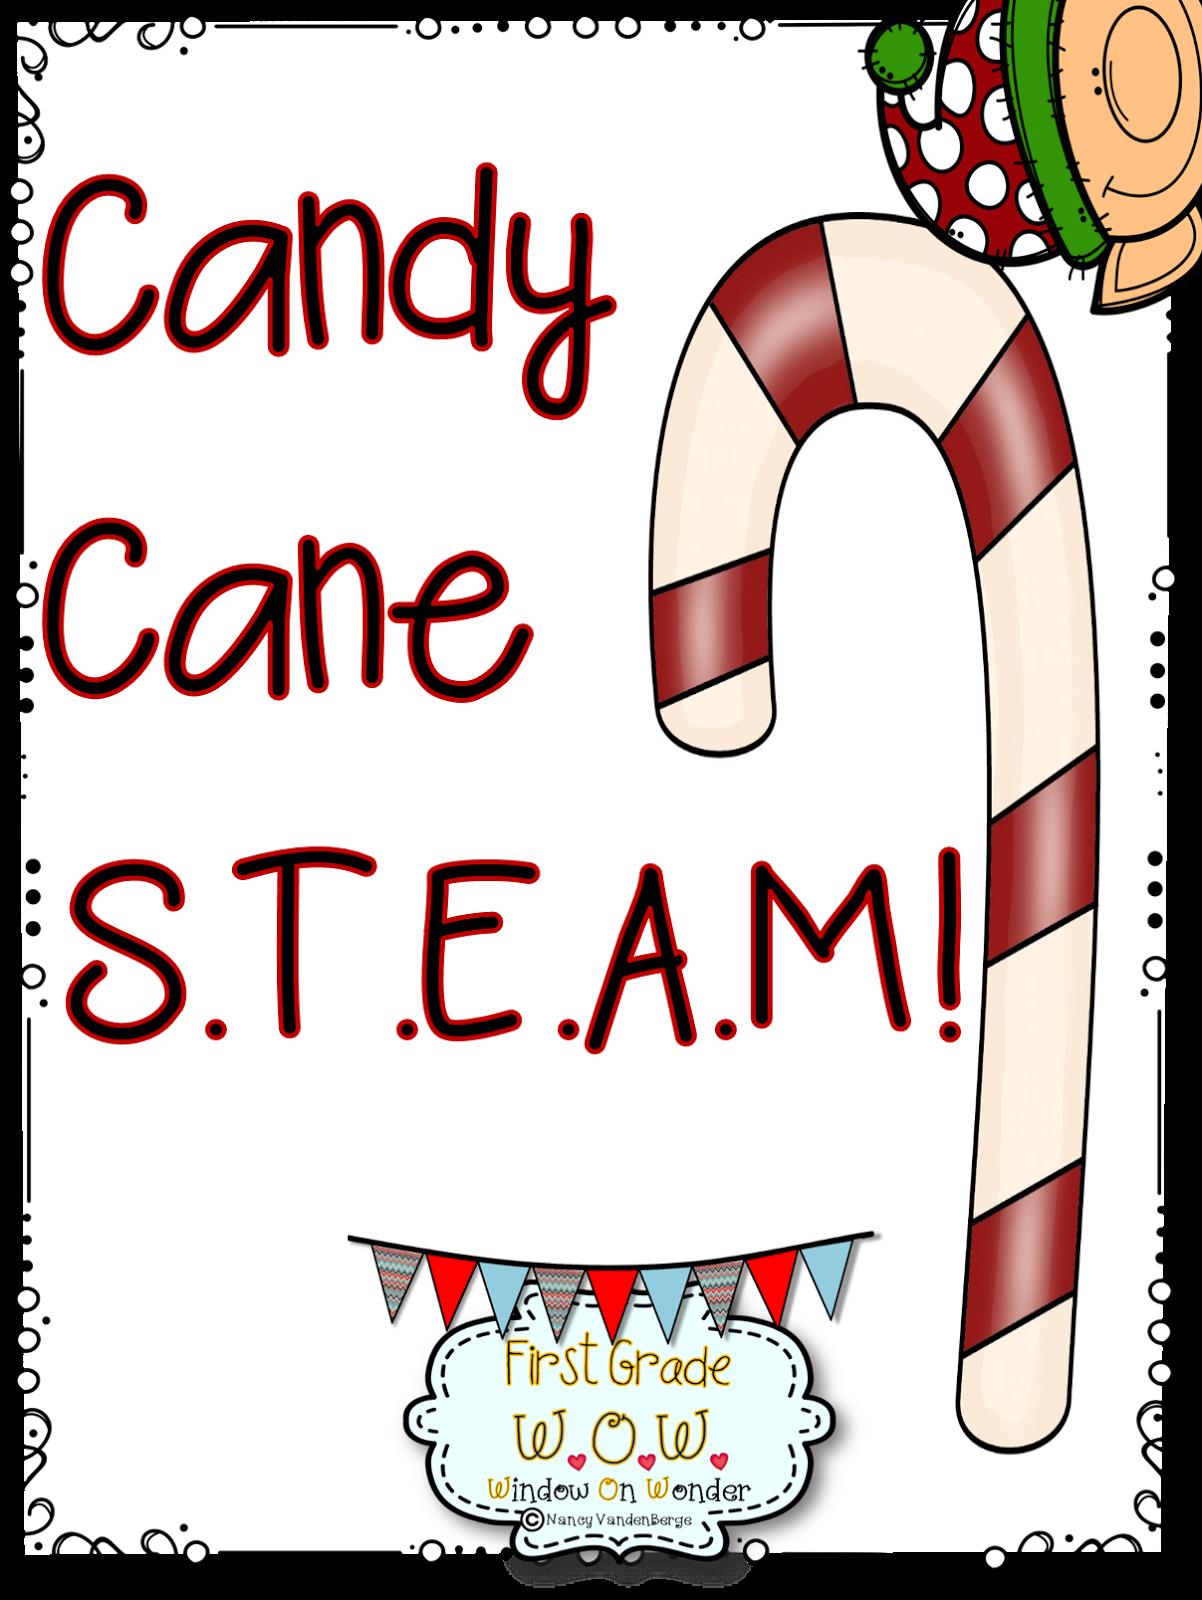 First Grade Wow Candy Cane Steam